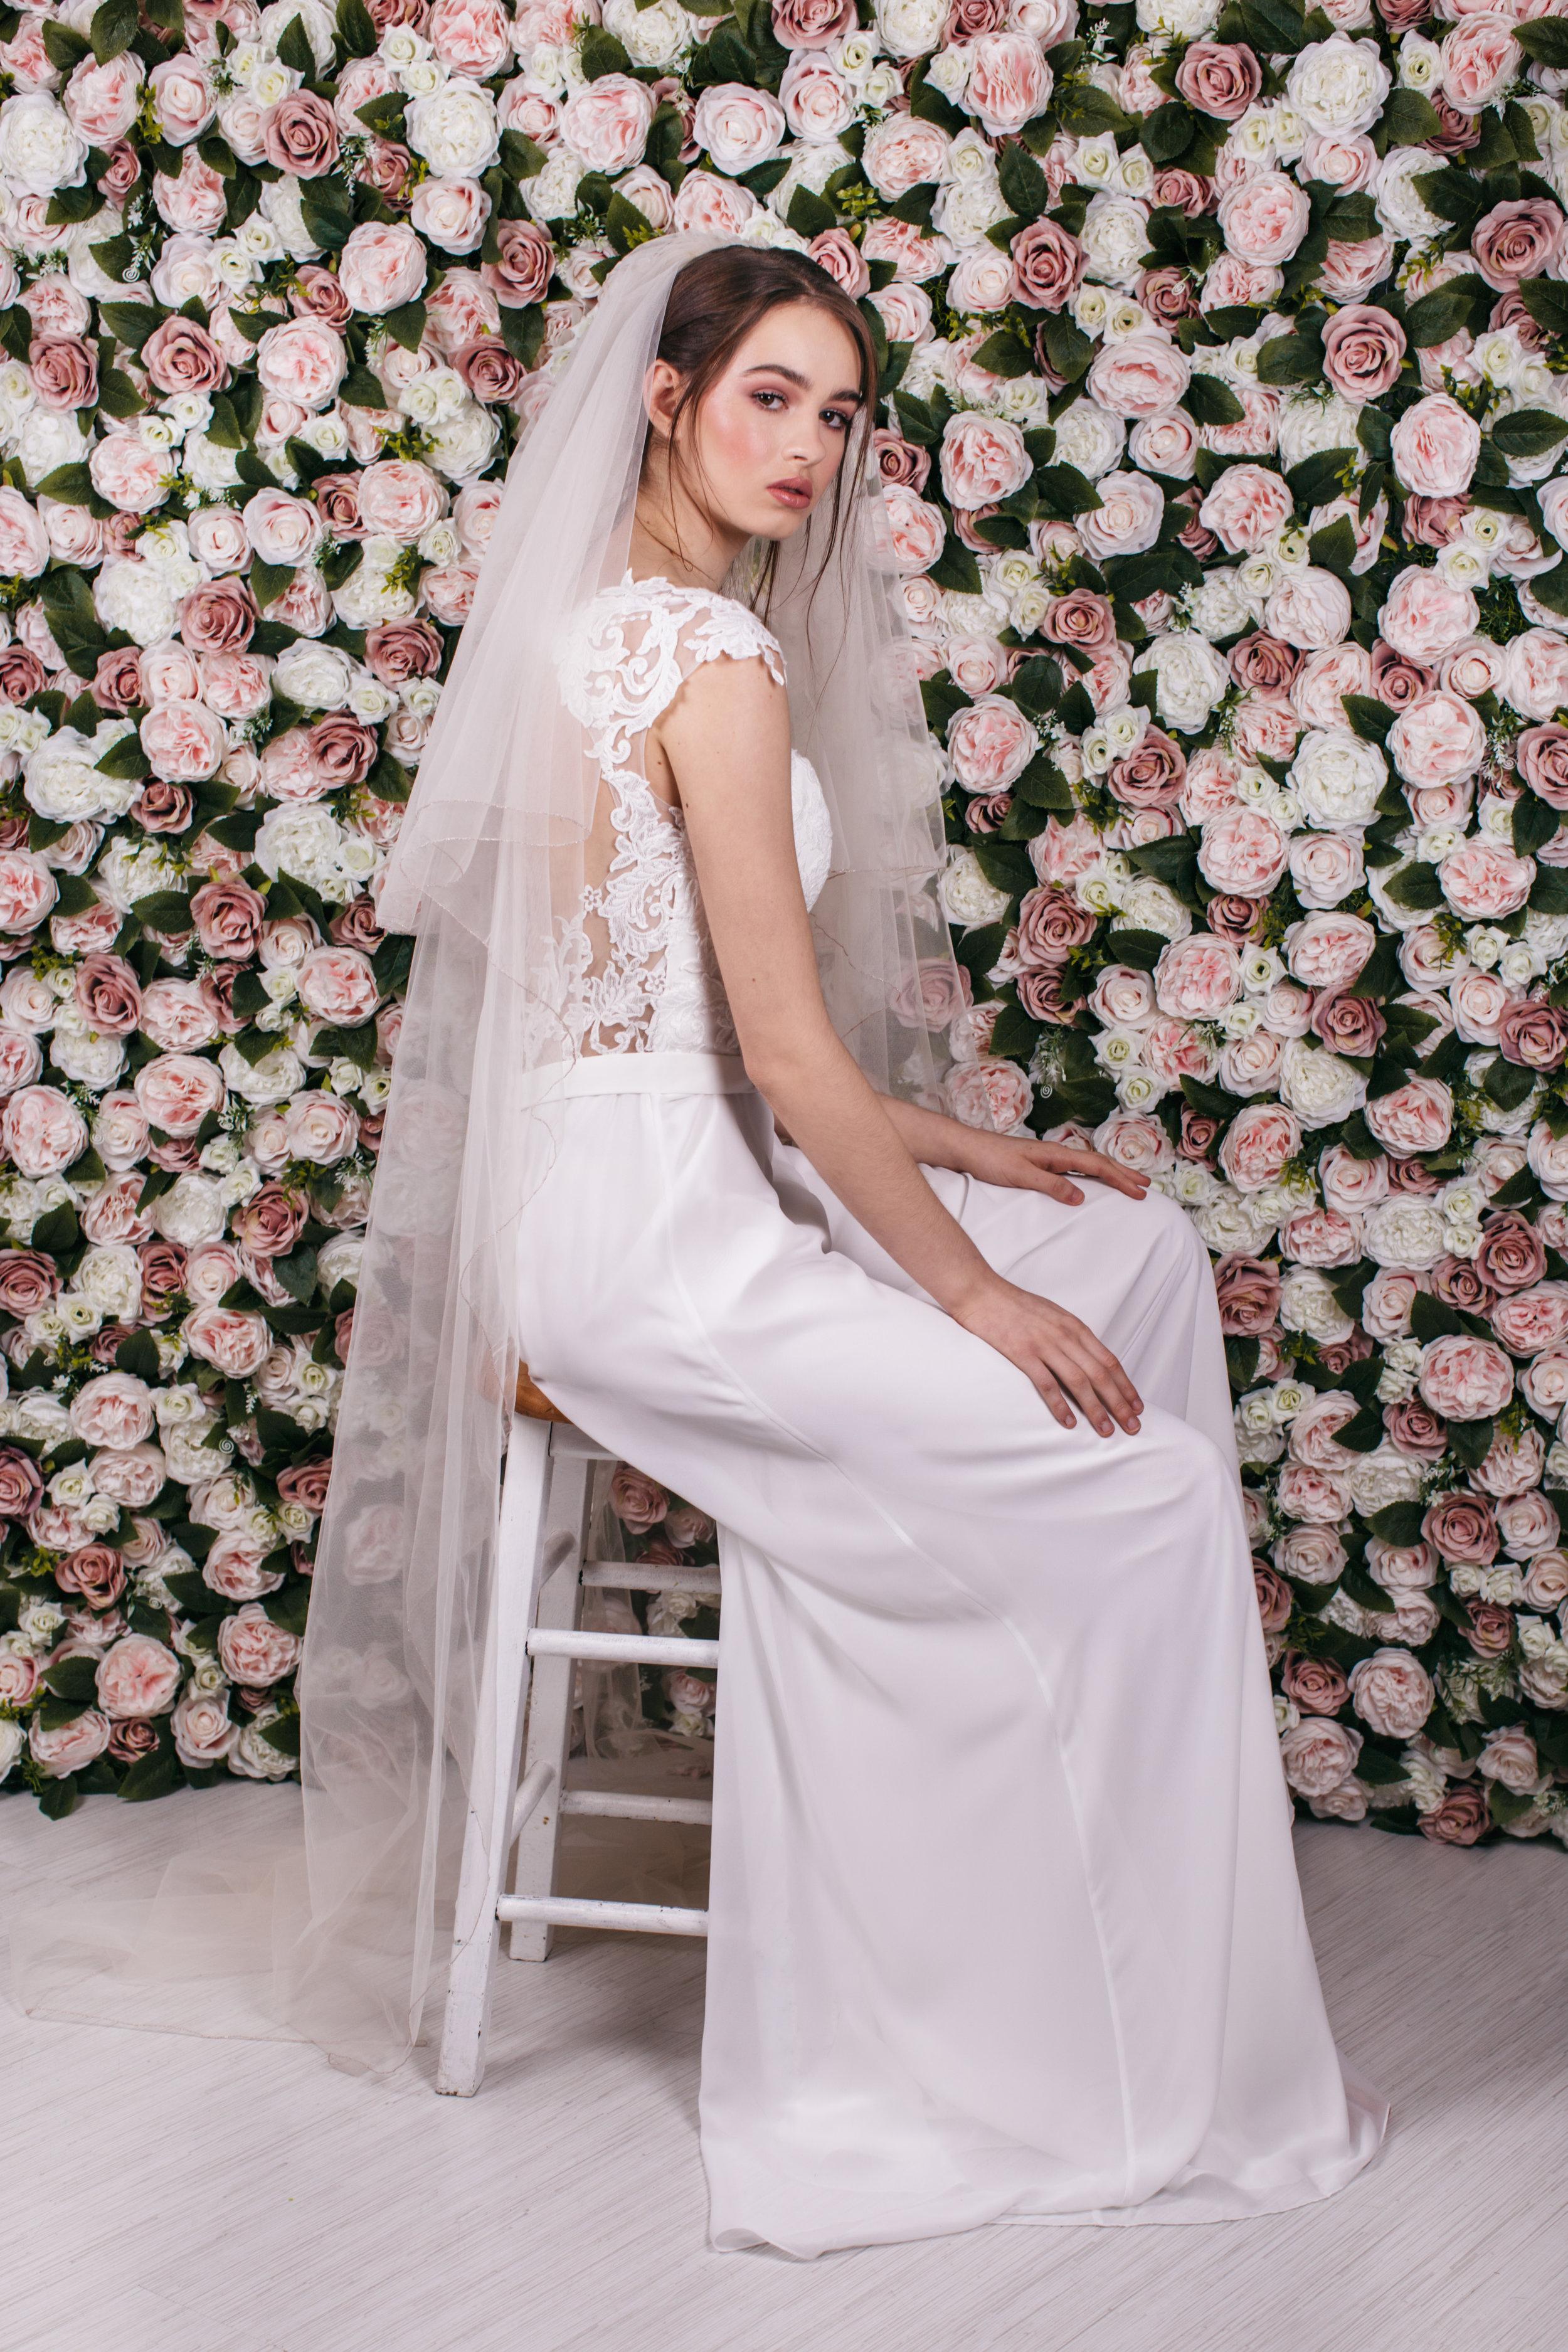 emma barrow flora hello petal your devon and cornwall wedding magazine charlotte balbier